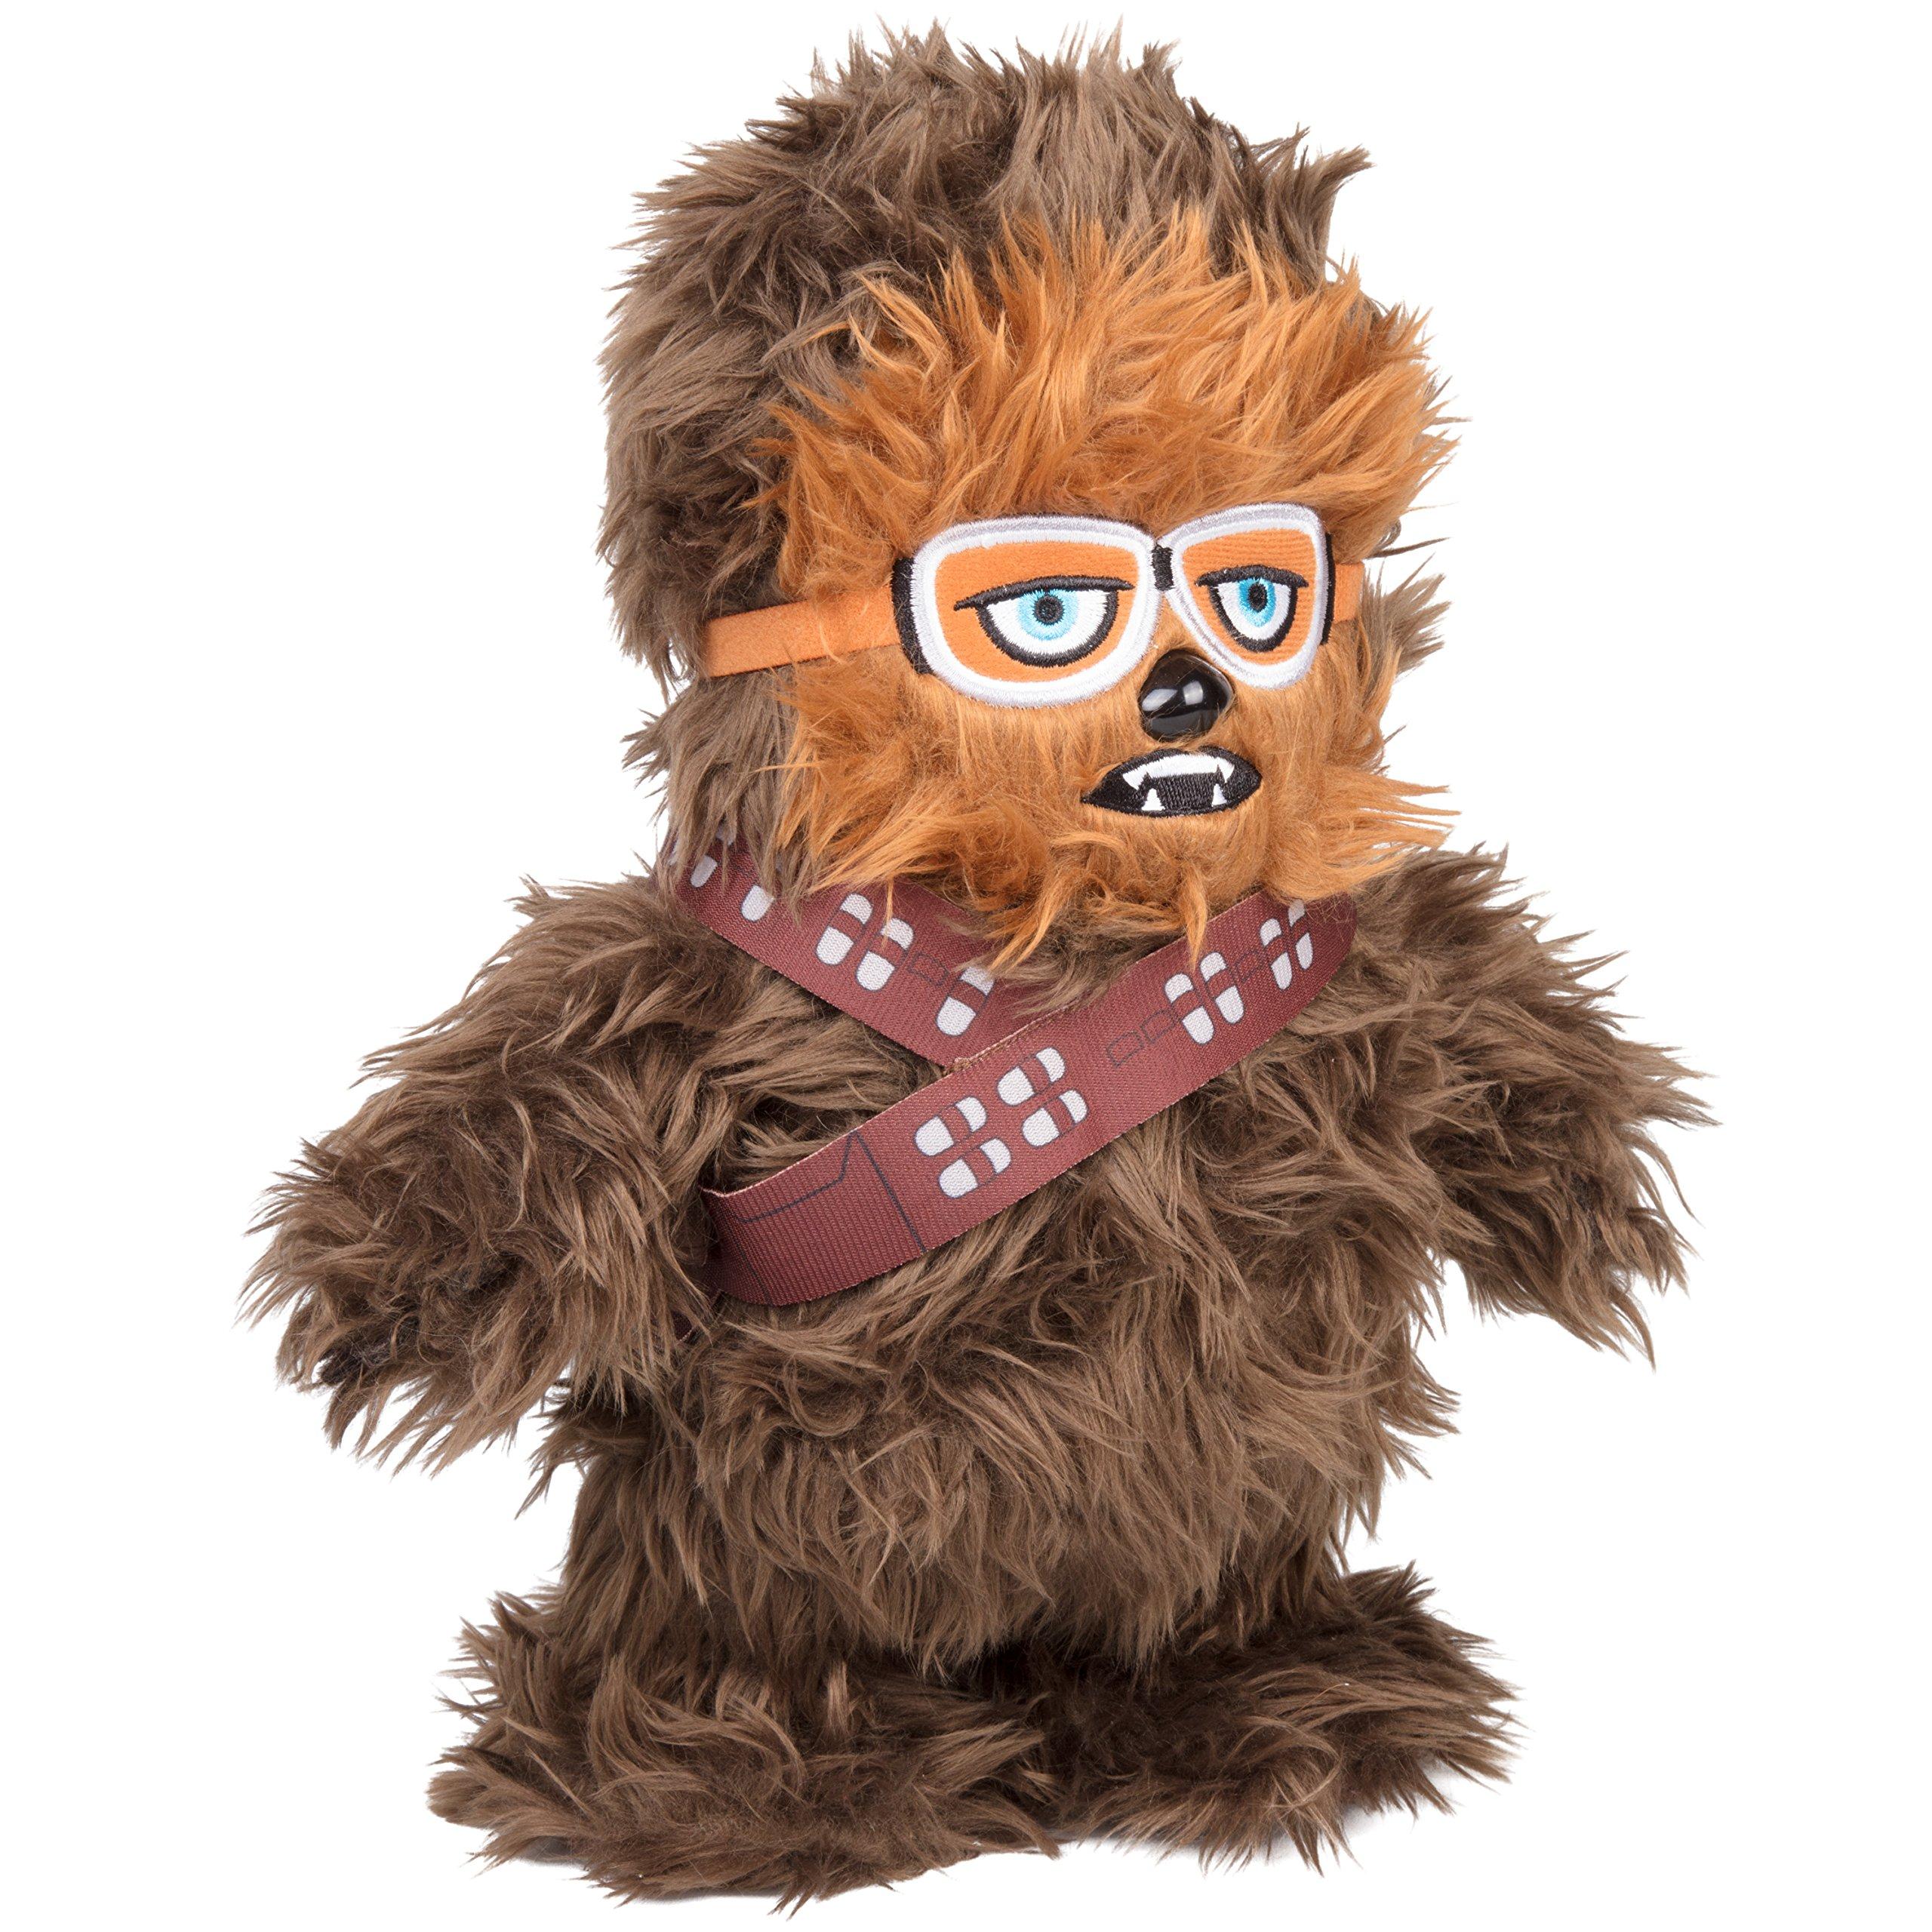 Wookiee Chewbacca Star Wars Plush